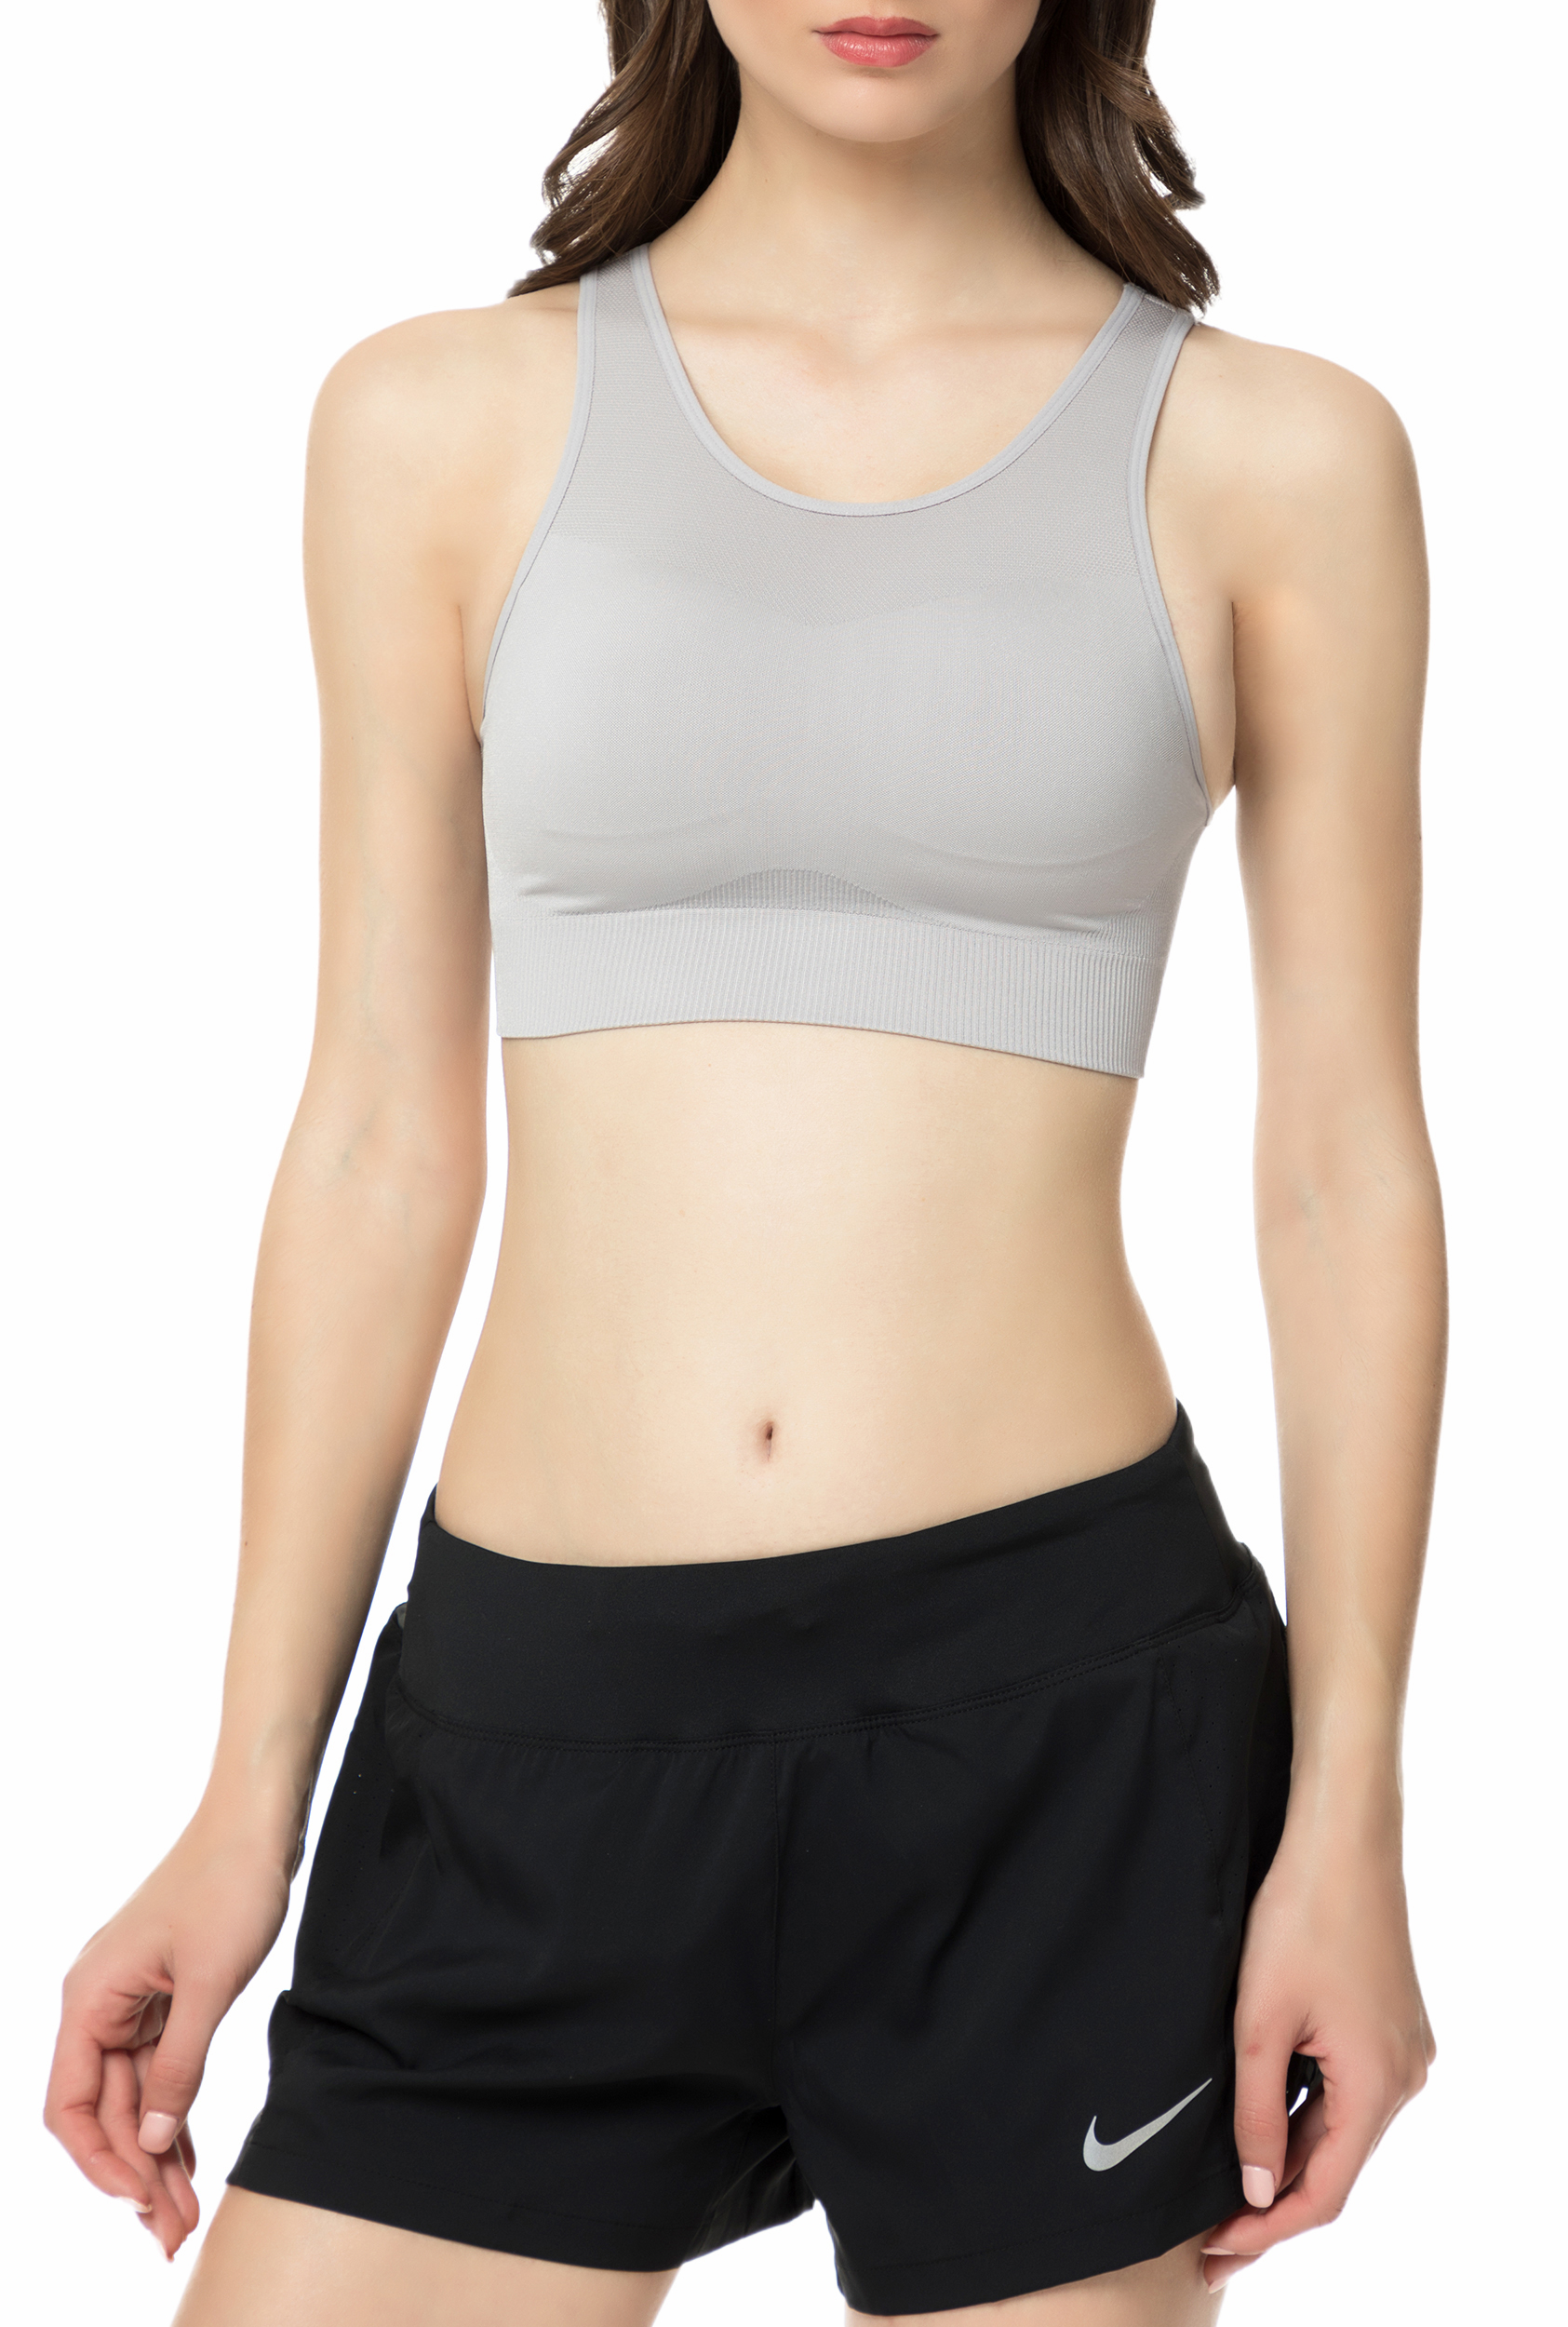 NIKE - Γυναικείο αθλητικό μπουστάκι NIKE SEAMLESS BRALETTE γκρι